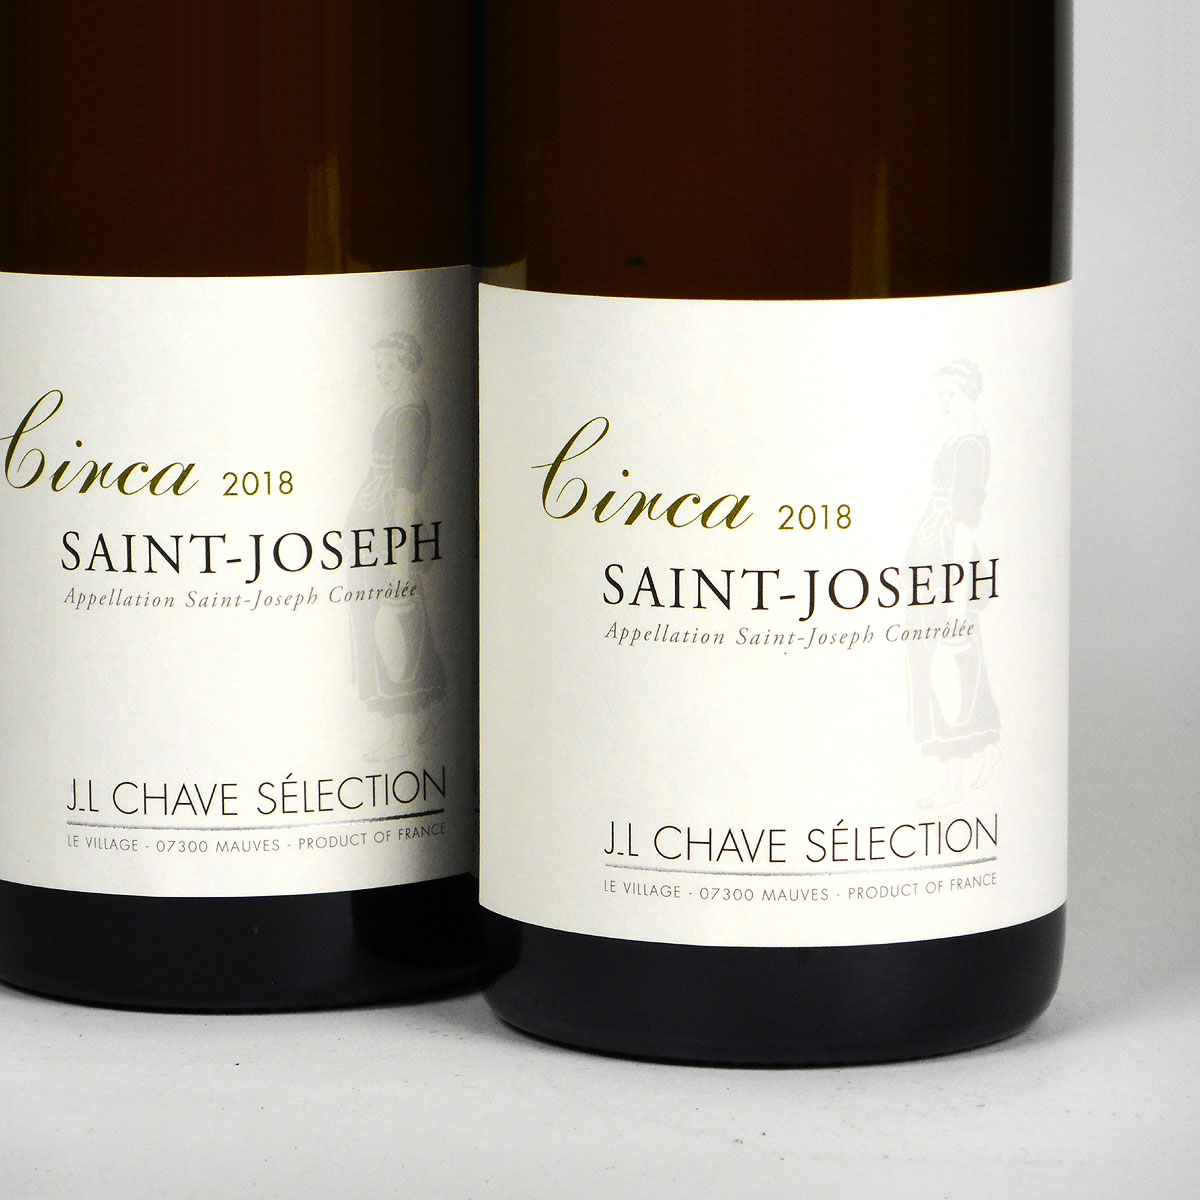 Saint-Joseph: Jean-Louis Chave Sélection 'Circa' Blanc 2018